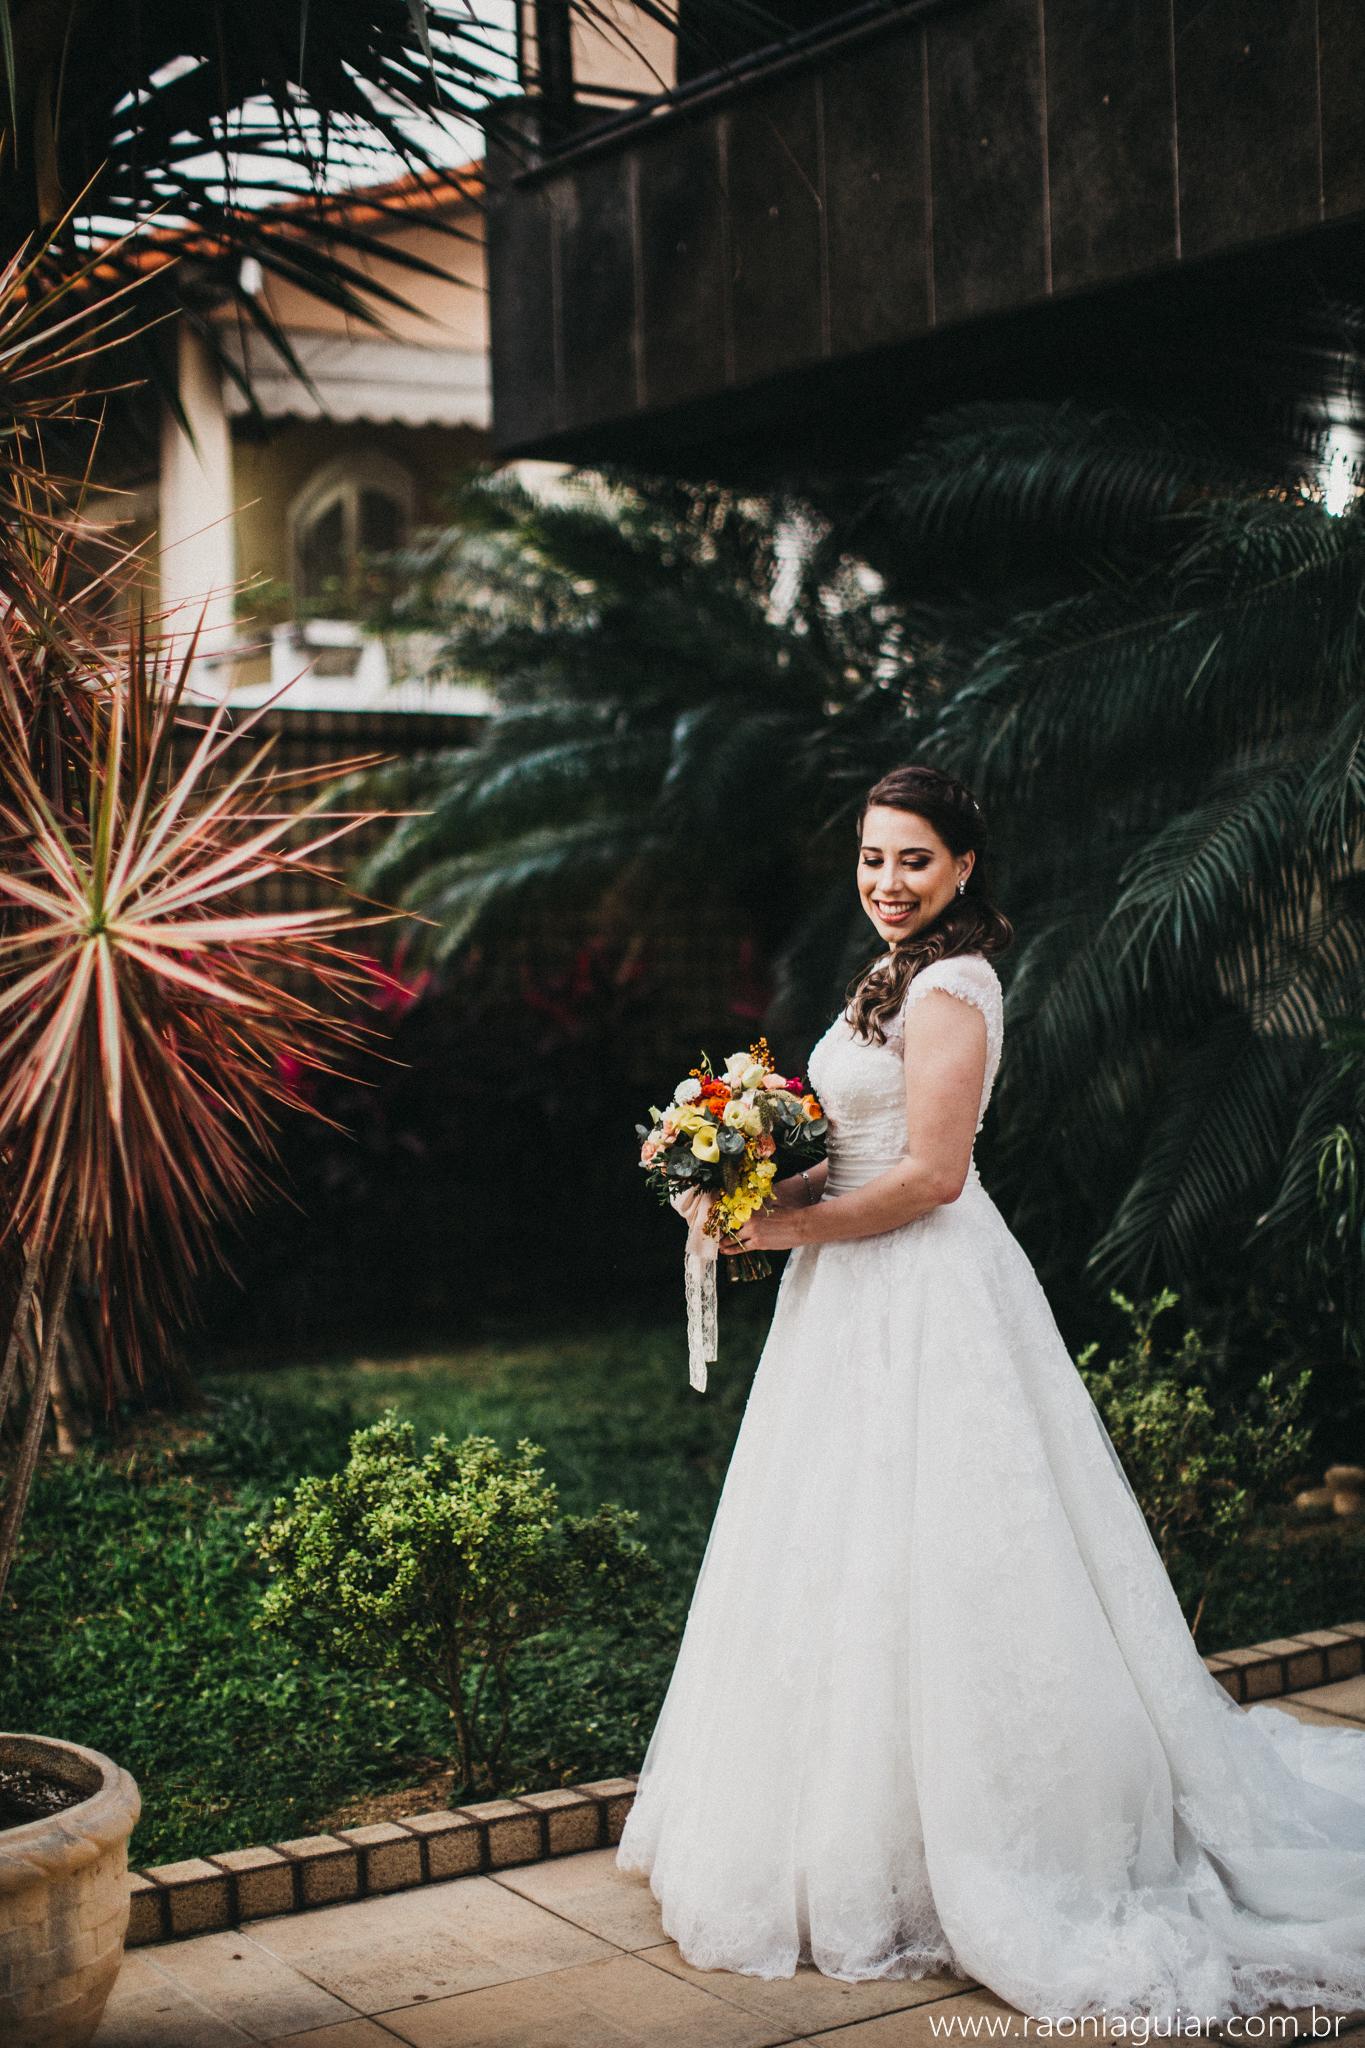 2018.10 Casamento Rebeca Soares e Felipe 0080.jpg